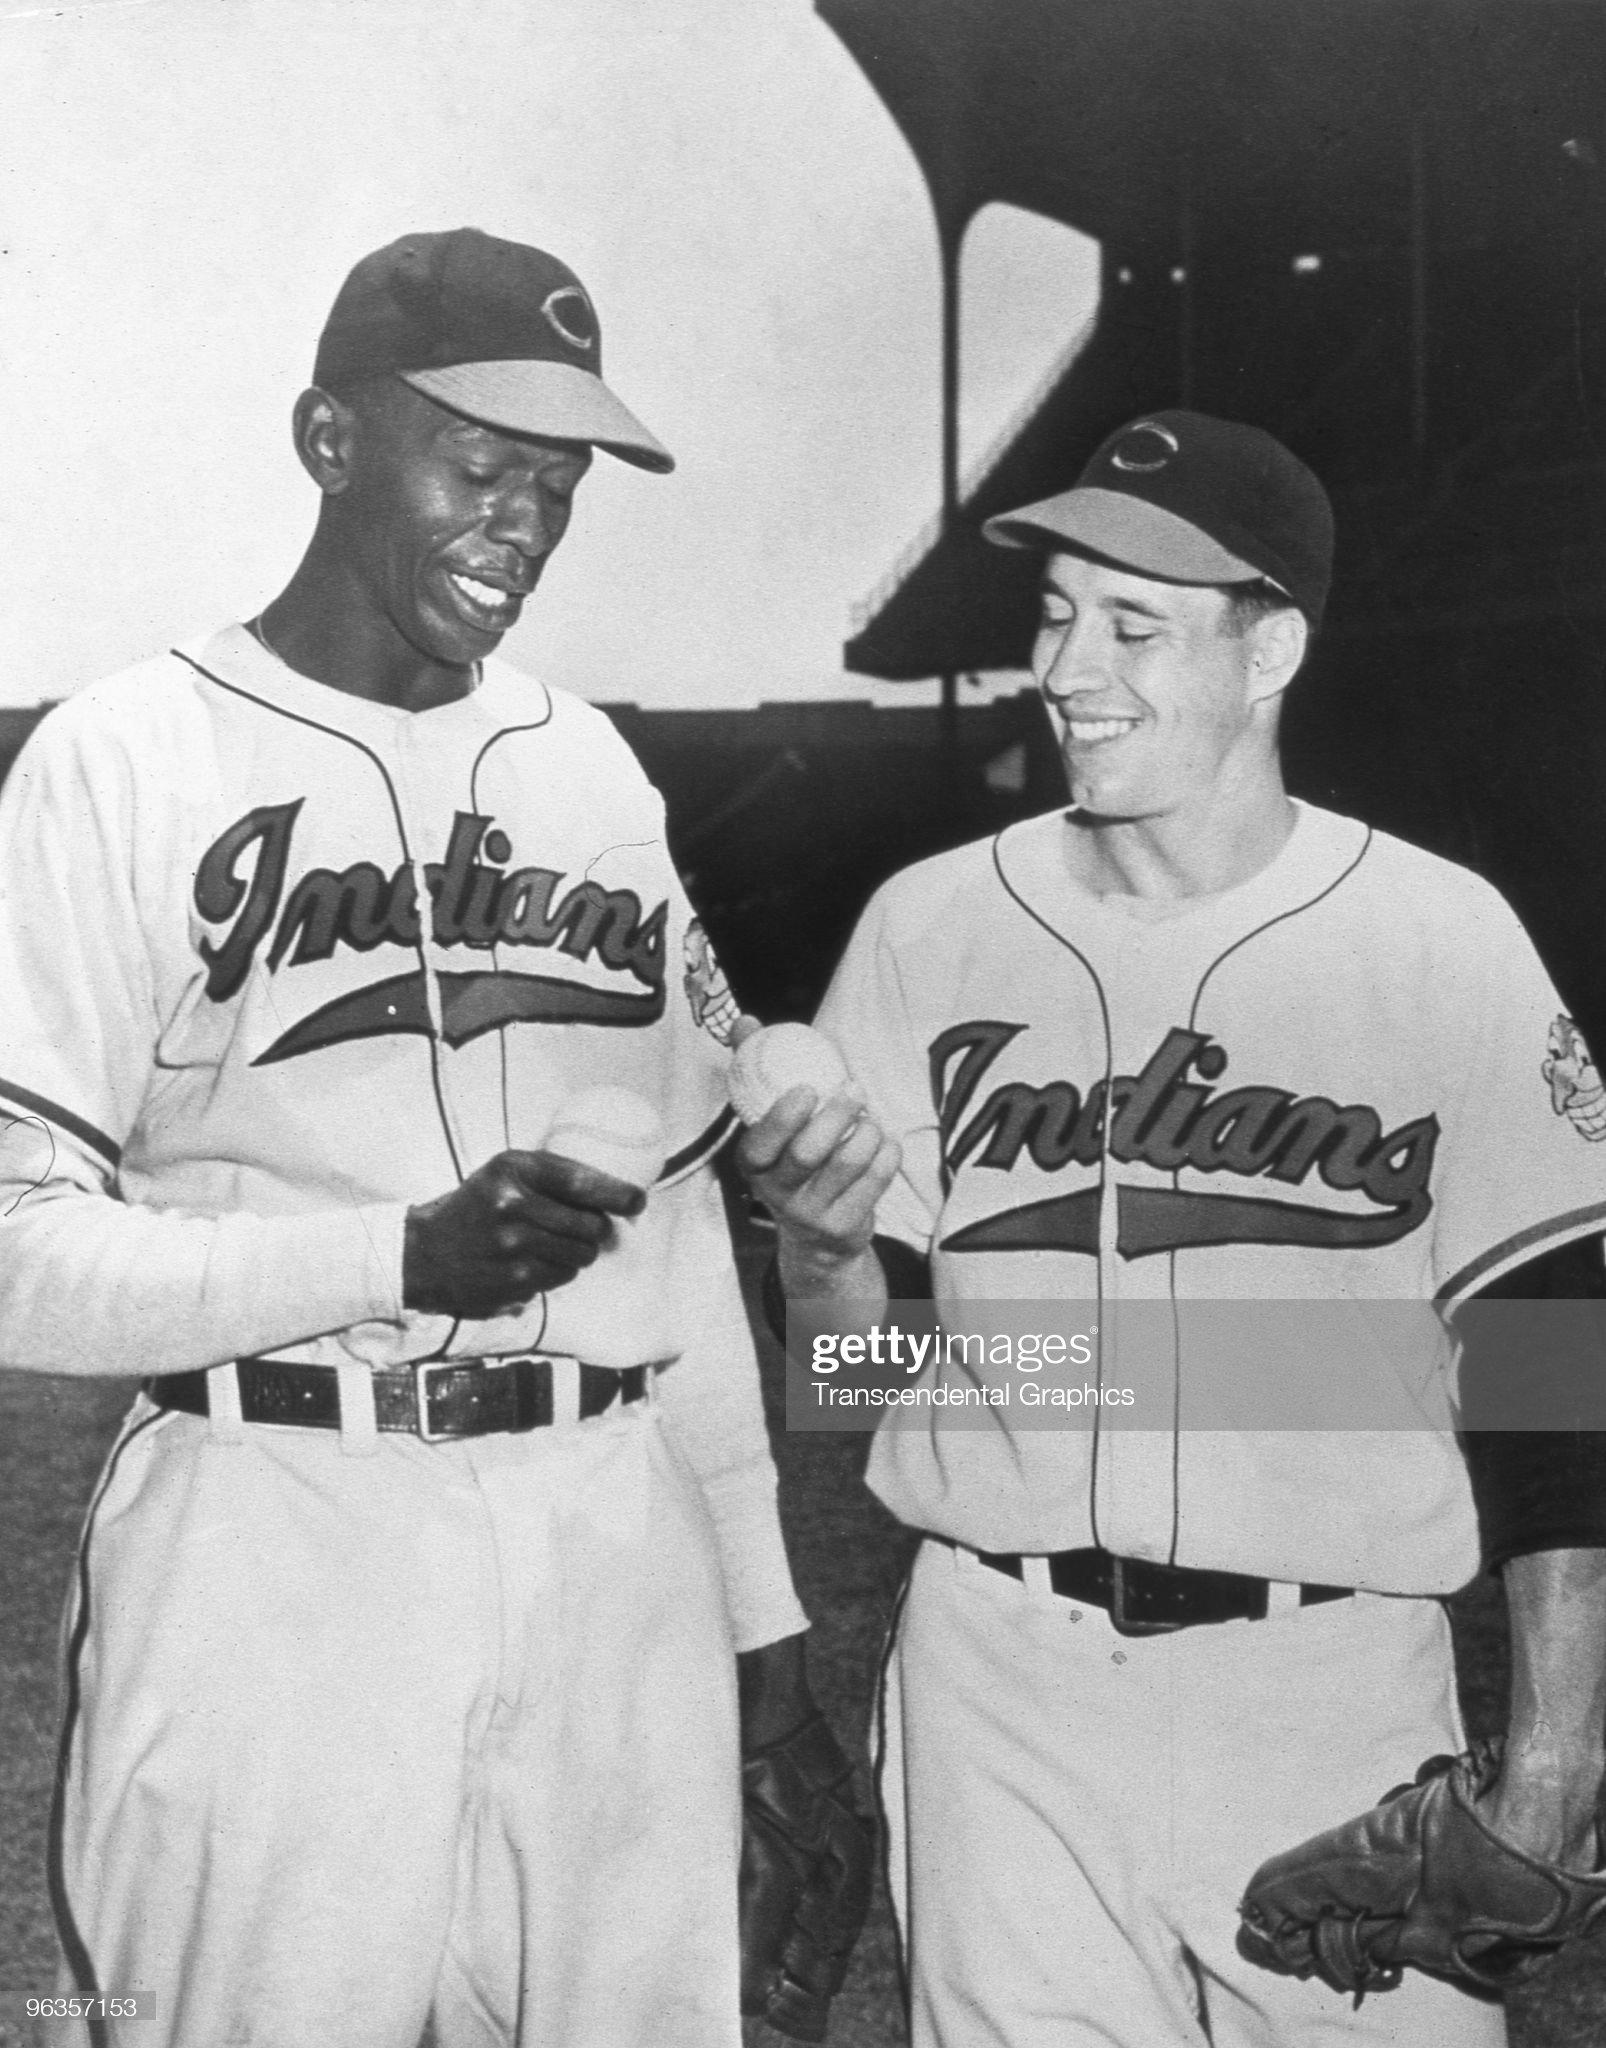 Satchel Paige Bob Feller Comparing Baseballs : News Photo